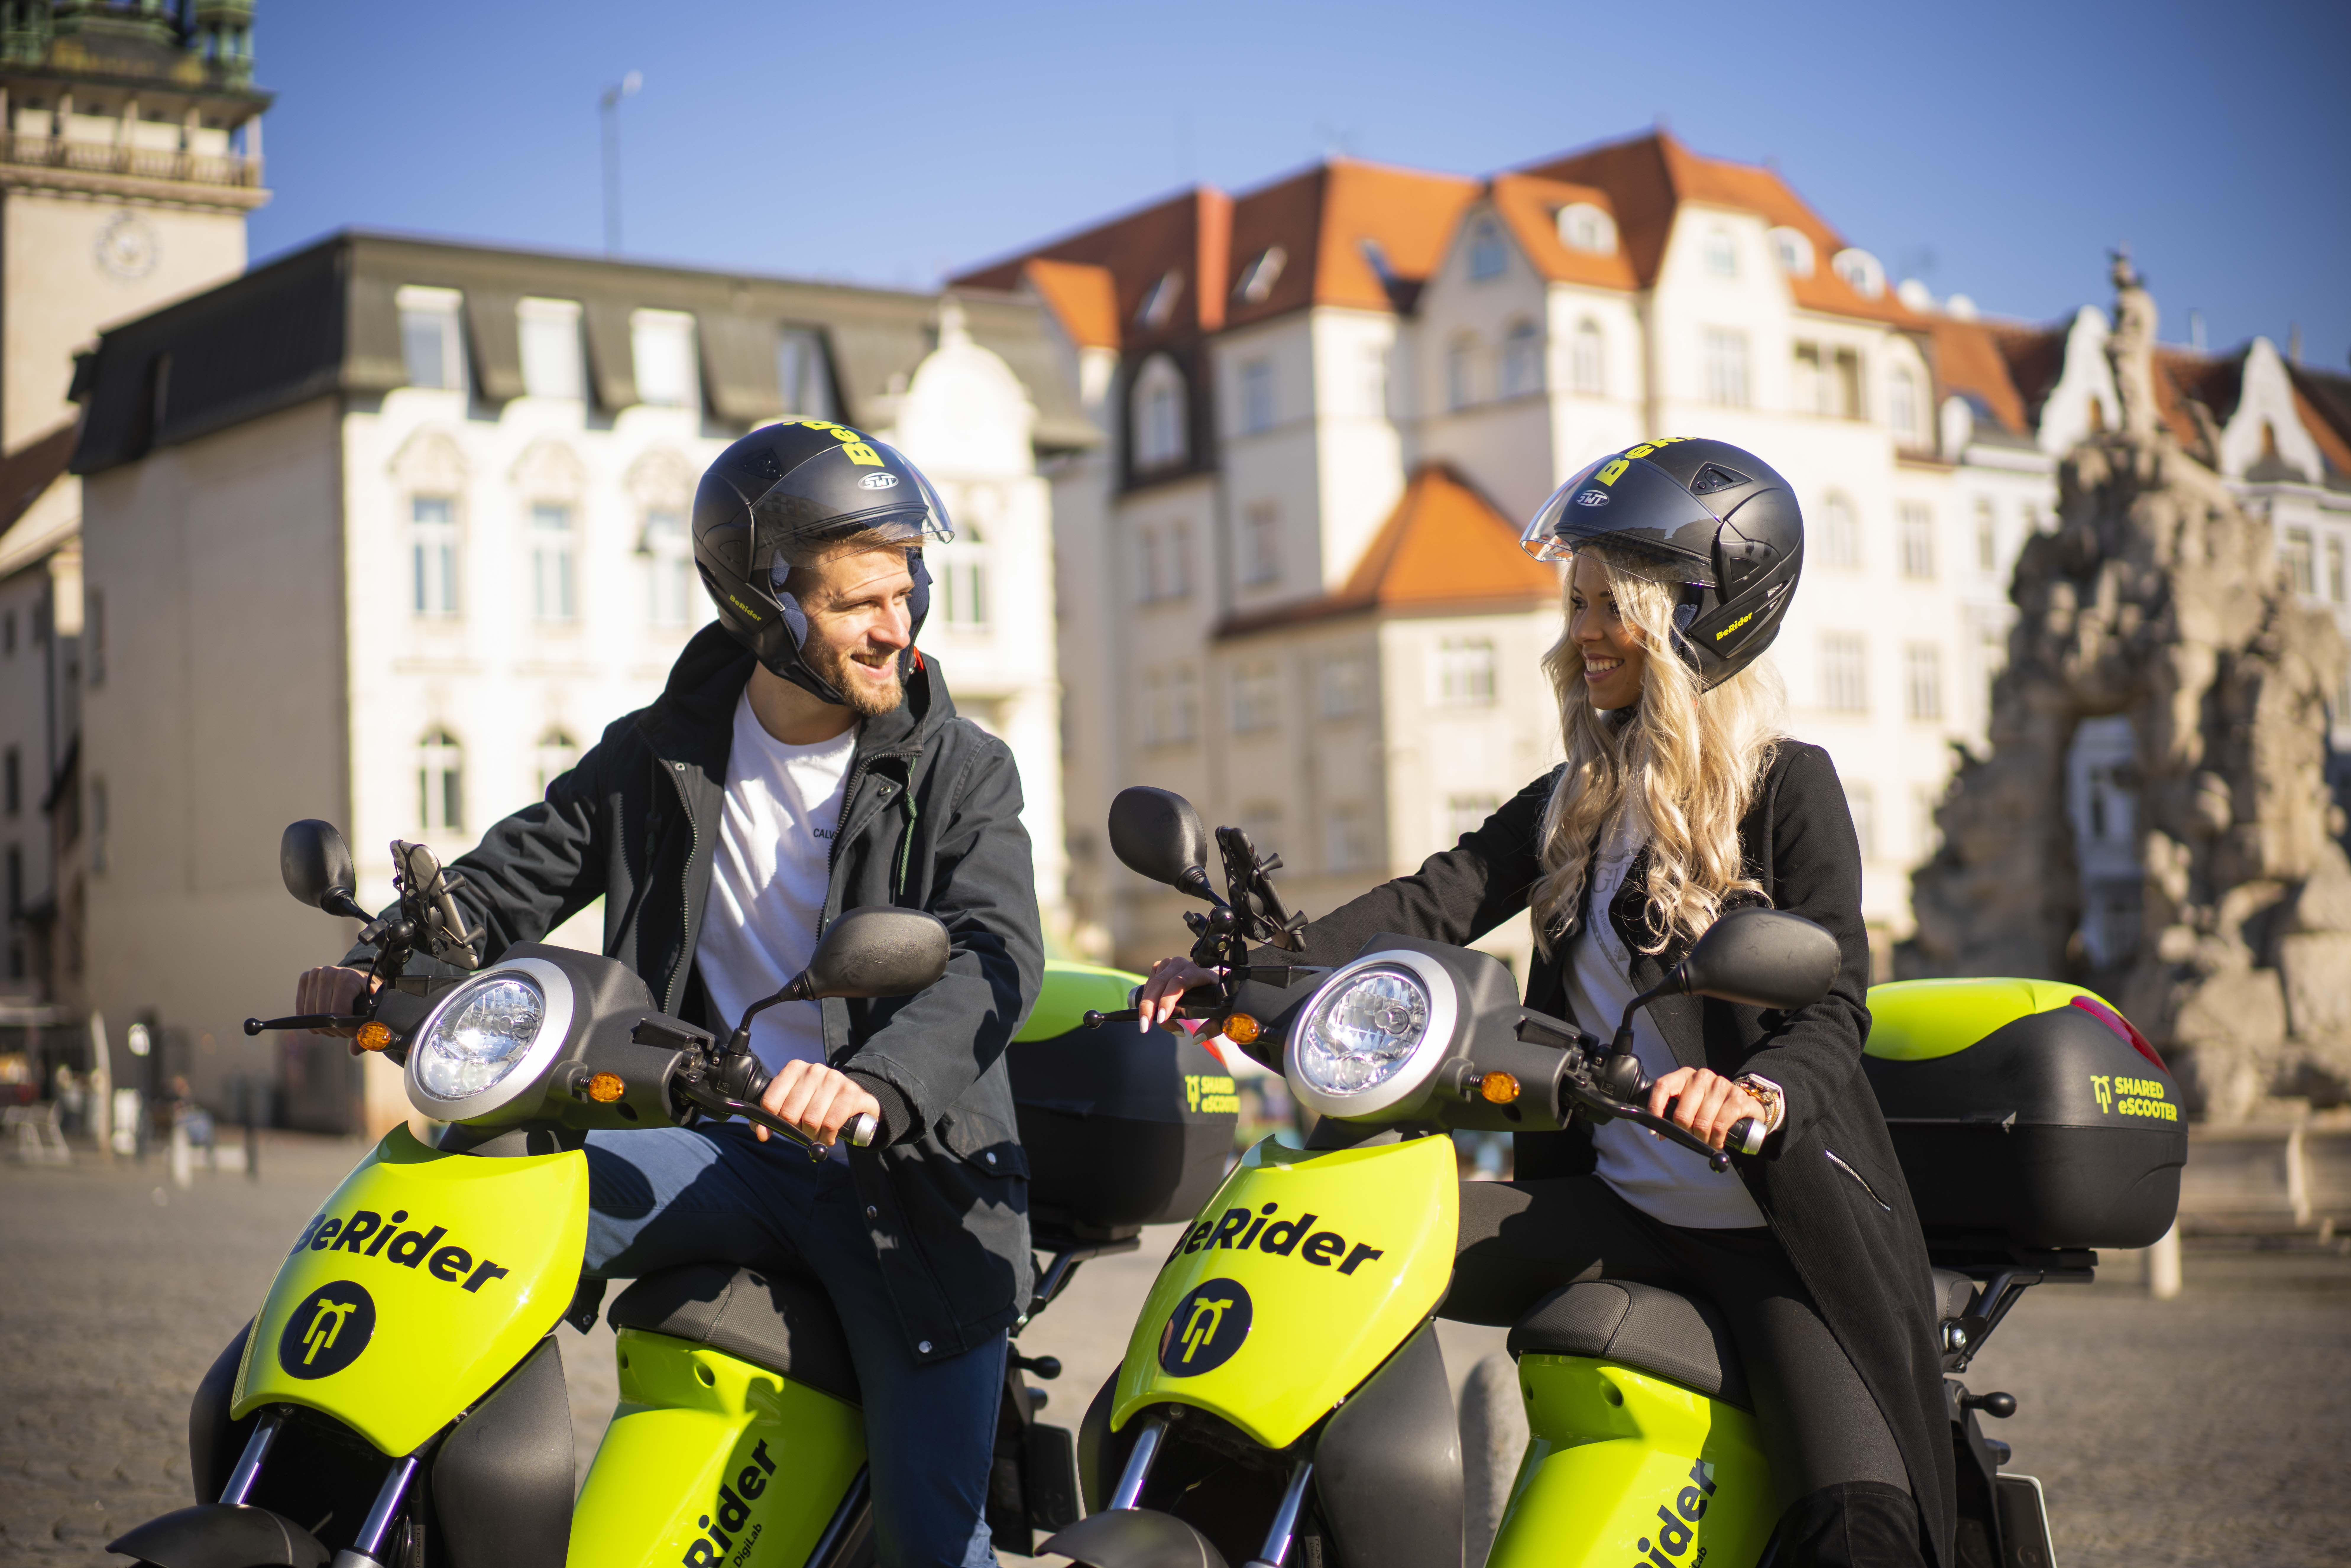 SKODA AUTO DigiLab brings BeRider e-scooter sharing to Brno - Image 3